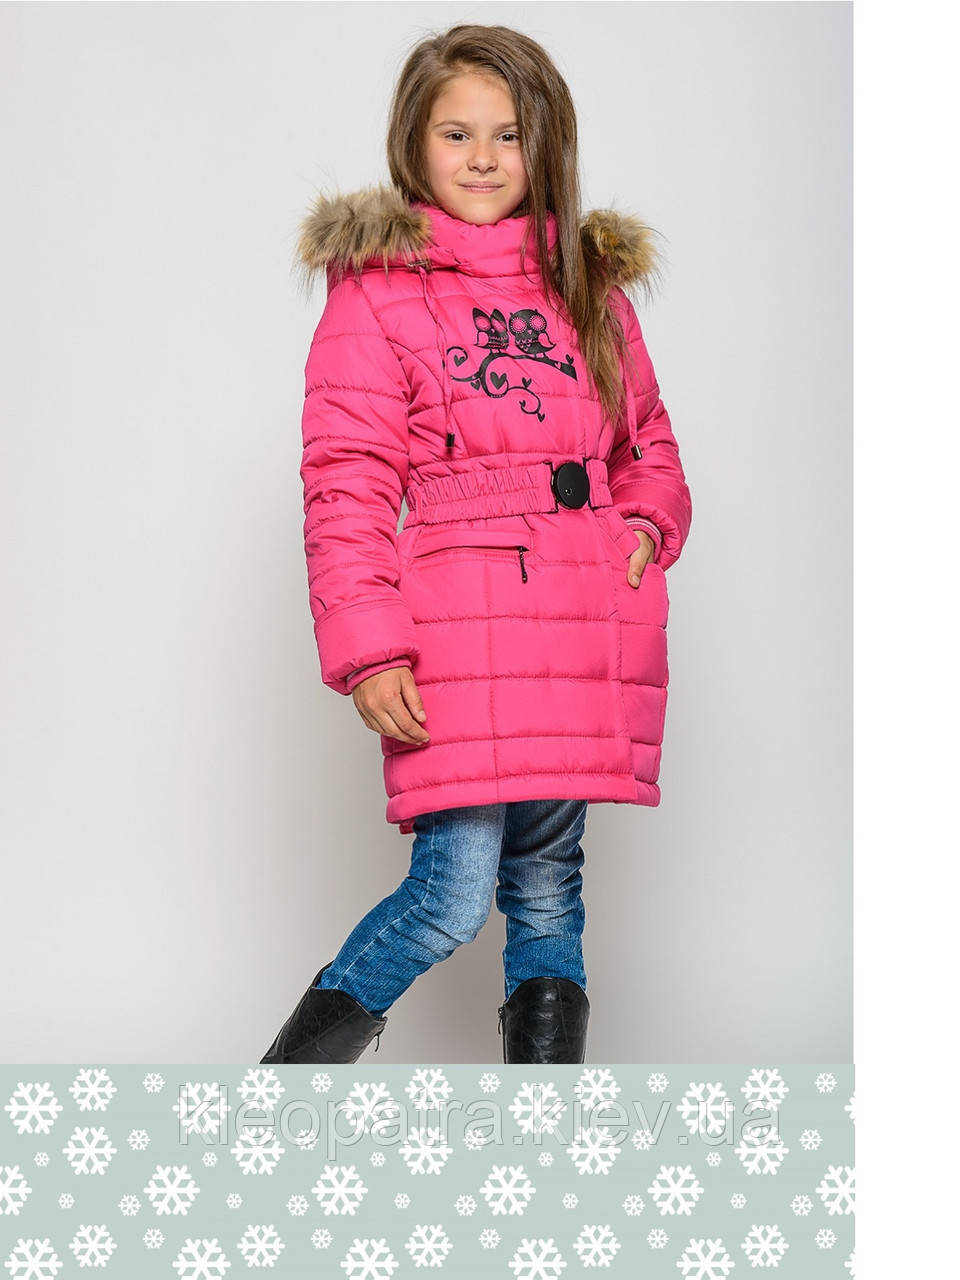 Пальто детское X-Woyz DT-8217, фото 1